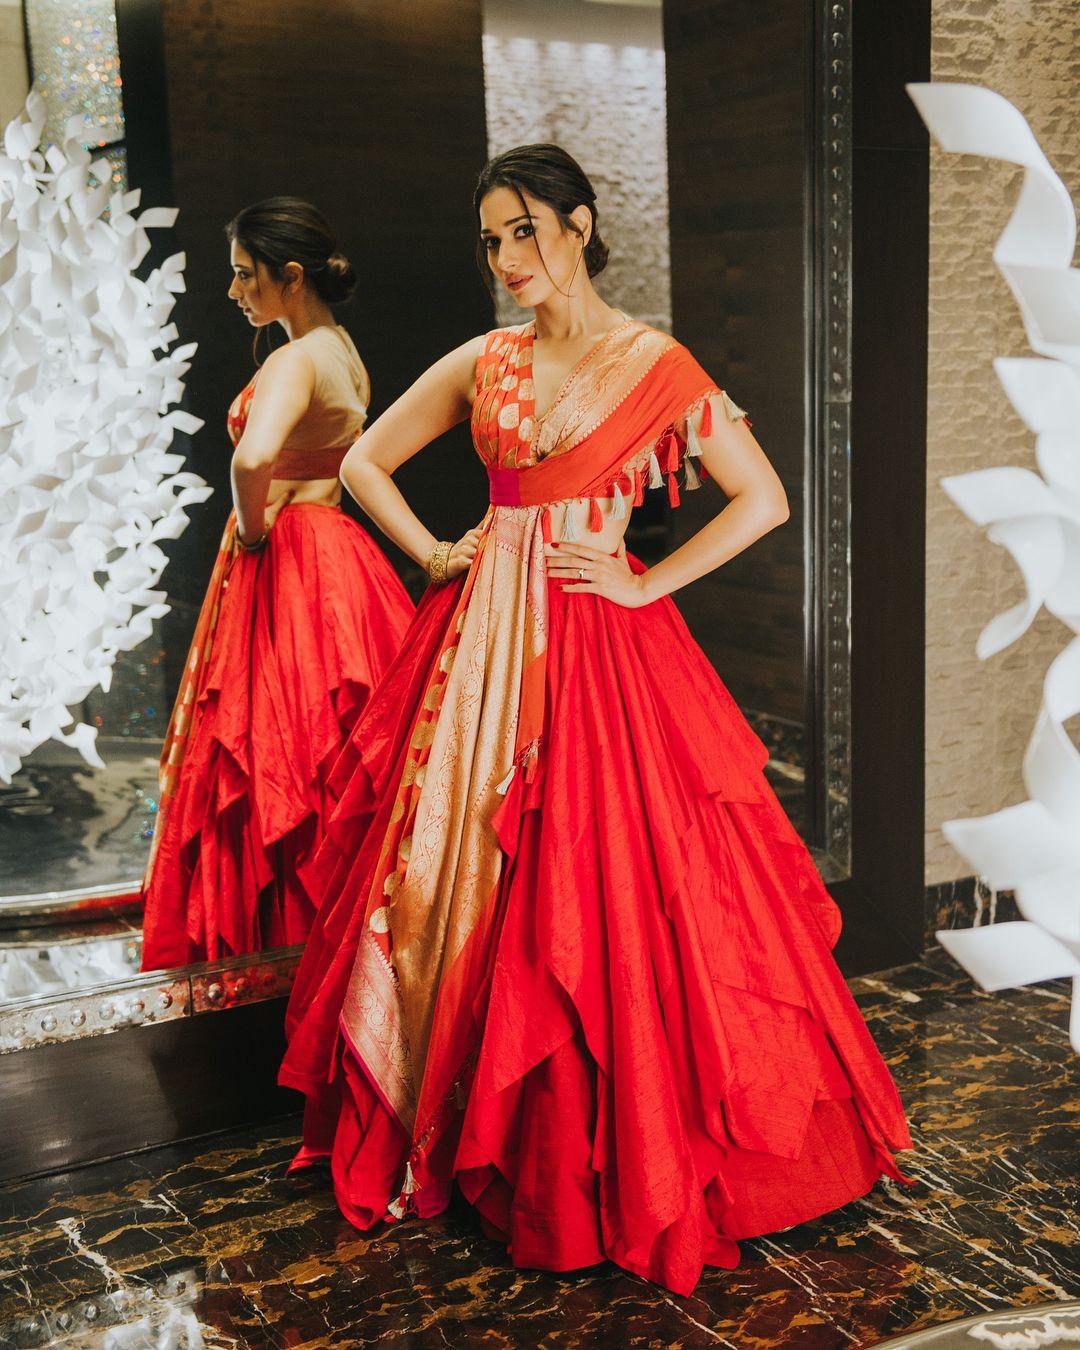 All Set For Santoshamawards In Hyderabad Wearing Shantanunikhil Styled By Sanjanabatra Make Indian Gowns Dresses Indian Bridal Dress Designer Dresses Indian